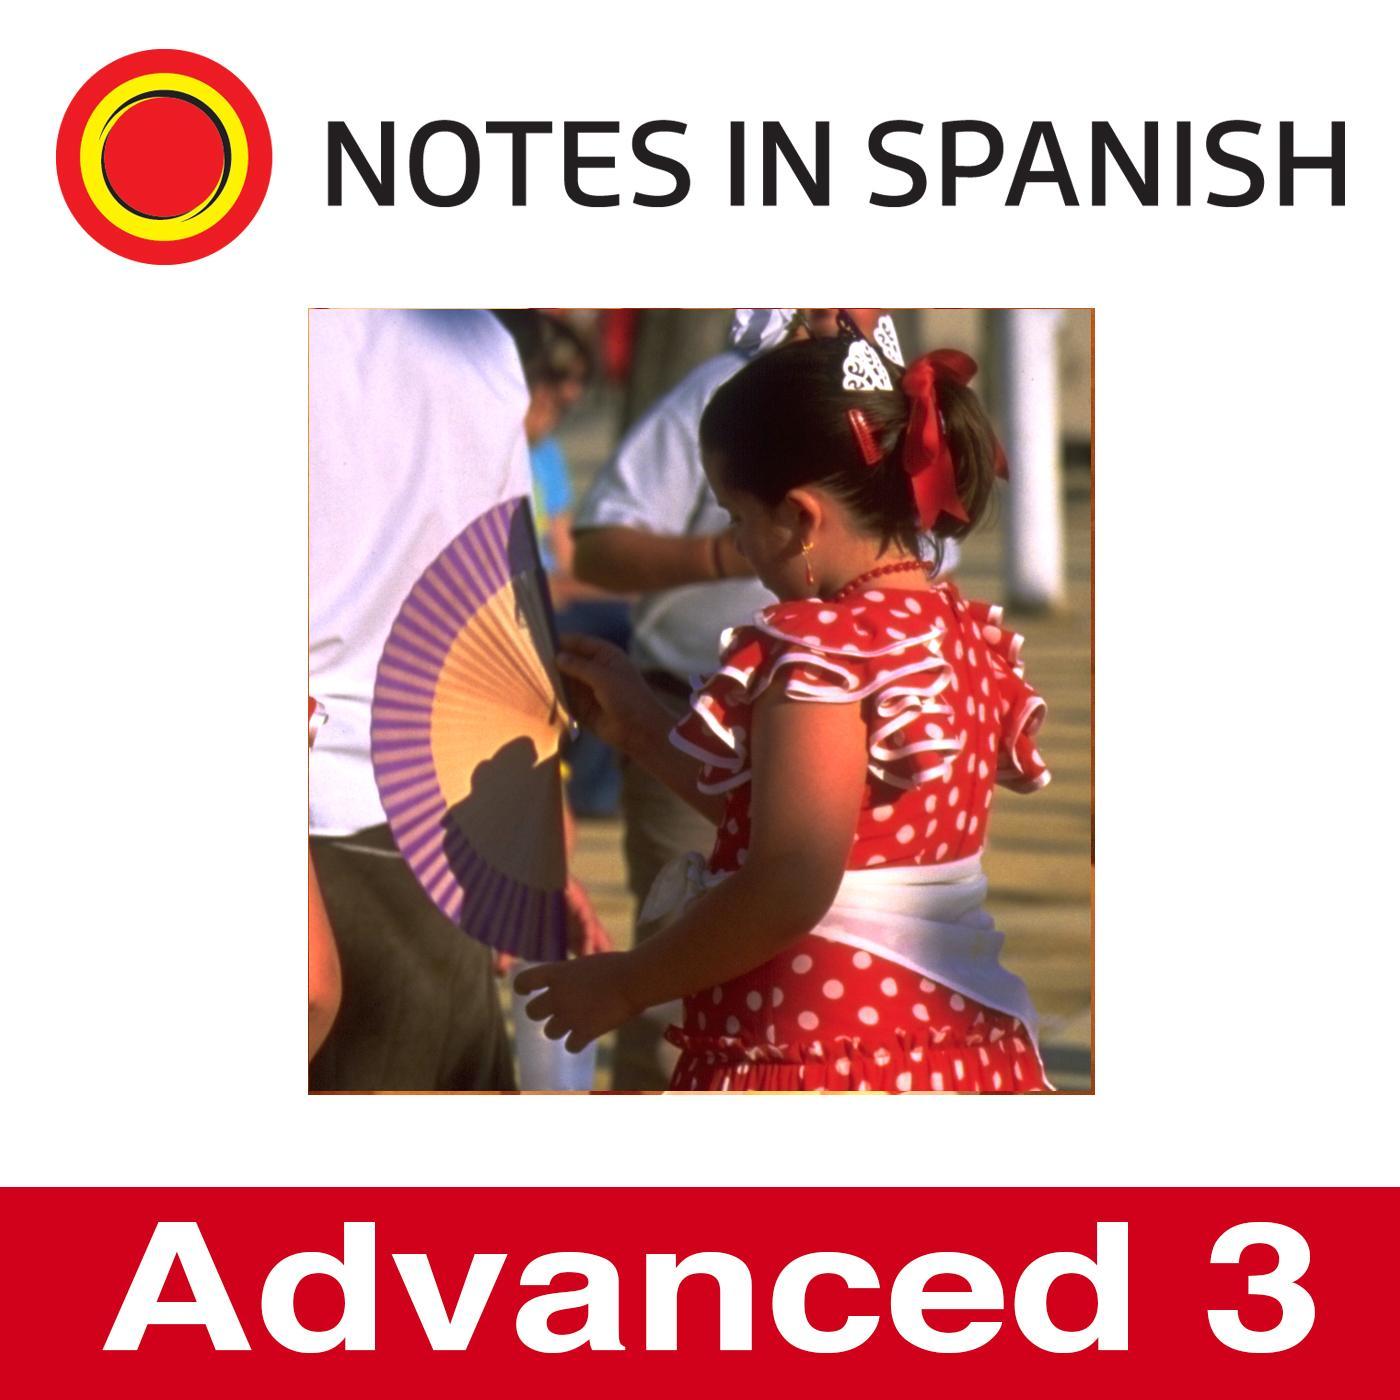 NIS Advanced S3 - 06 - El-Maestro Yo-Yo